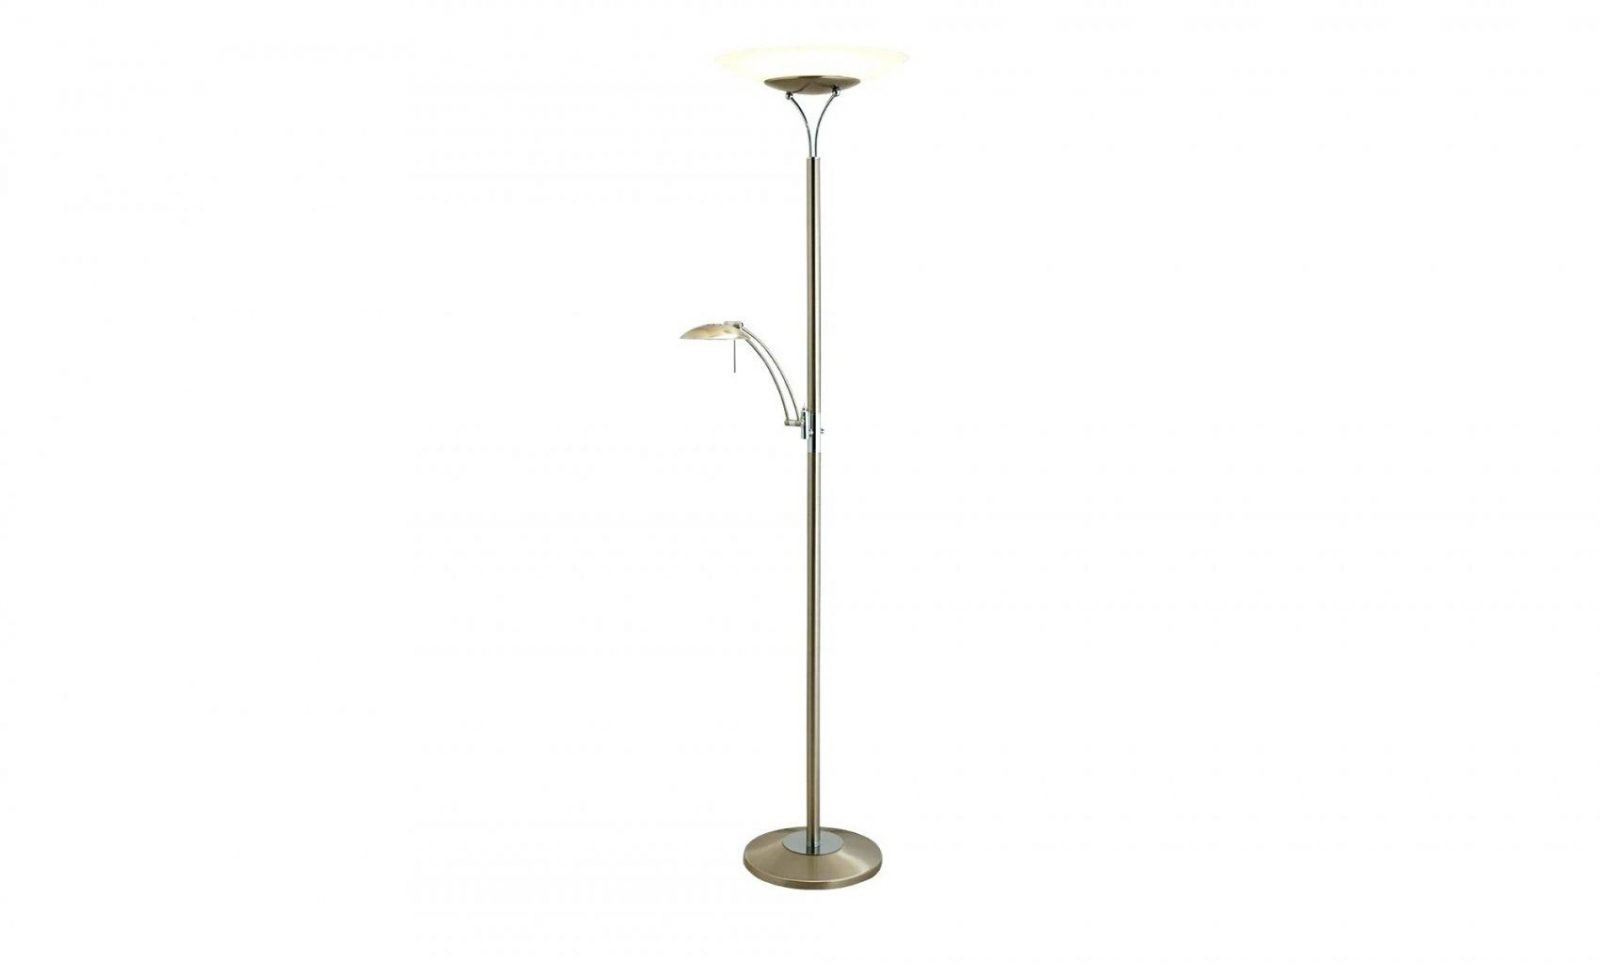 led stehlampe mit leselampe dimmbar simple nord briloner chrom aldi leseleuchte stehlampe. Black Bedroom Furniture Sets. Home Design Ideas